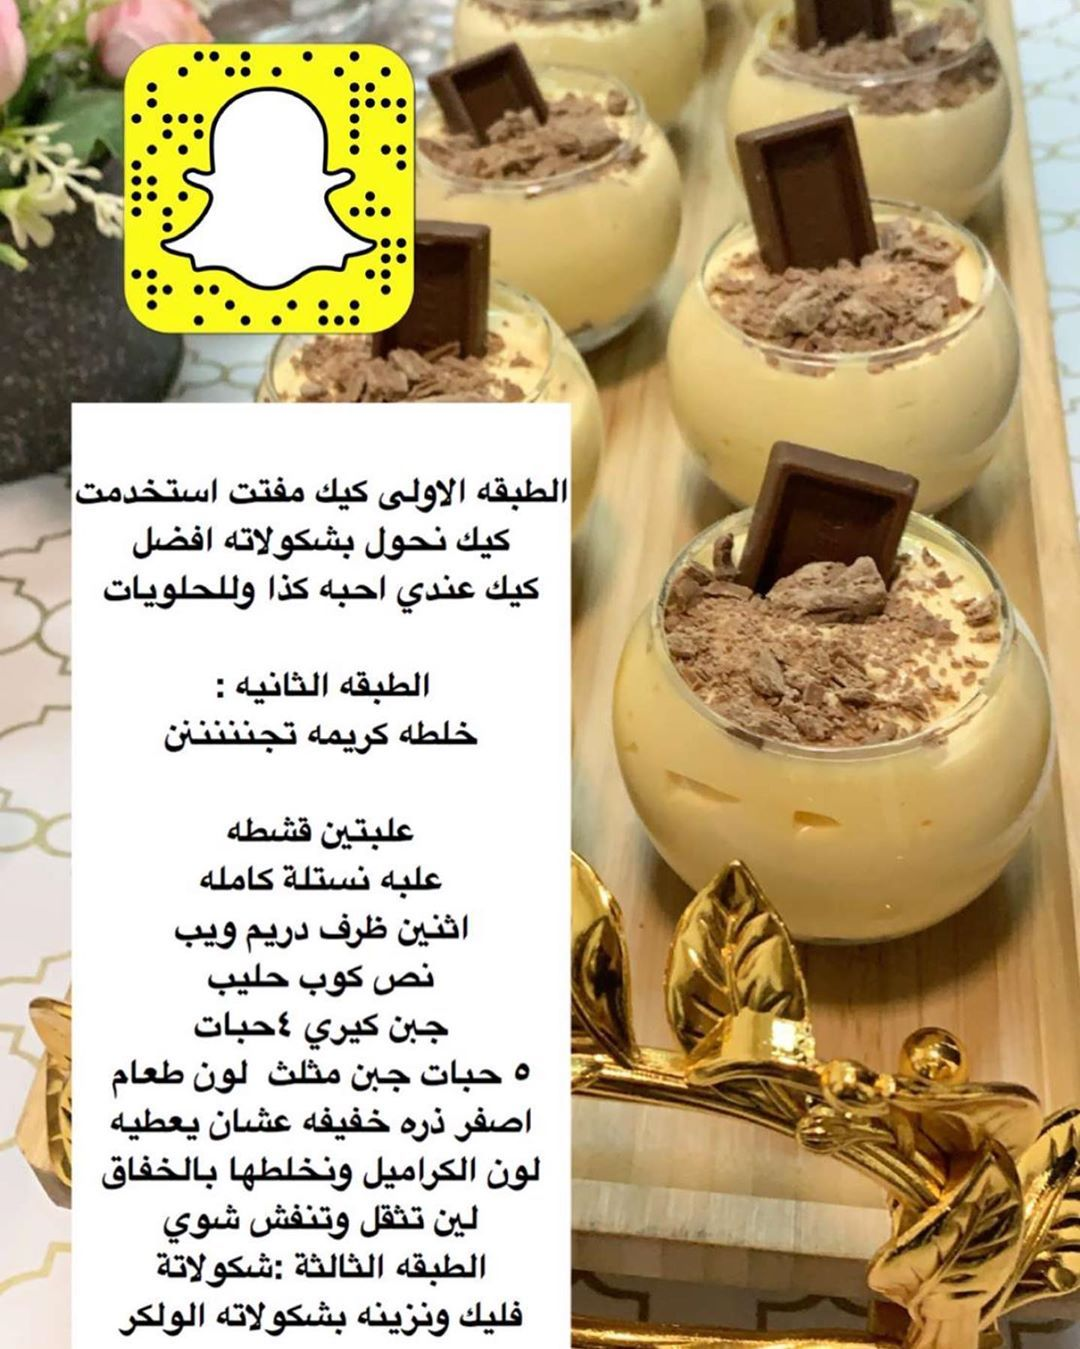 978 Likes 0 Comments الح مد لله فوق ك ل ش عور Aklat25 On Instagram وصفات منقوله Food Drinks Dessert Yummy Food Dessert Food Videos Desserts